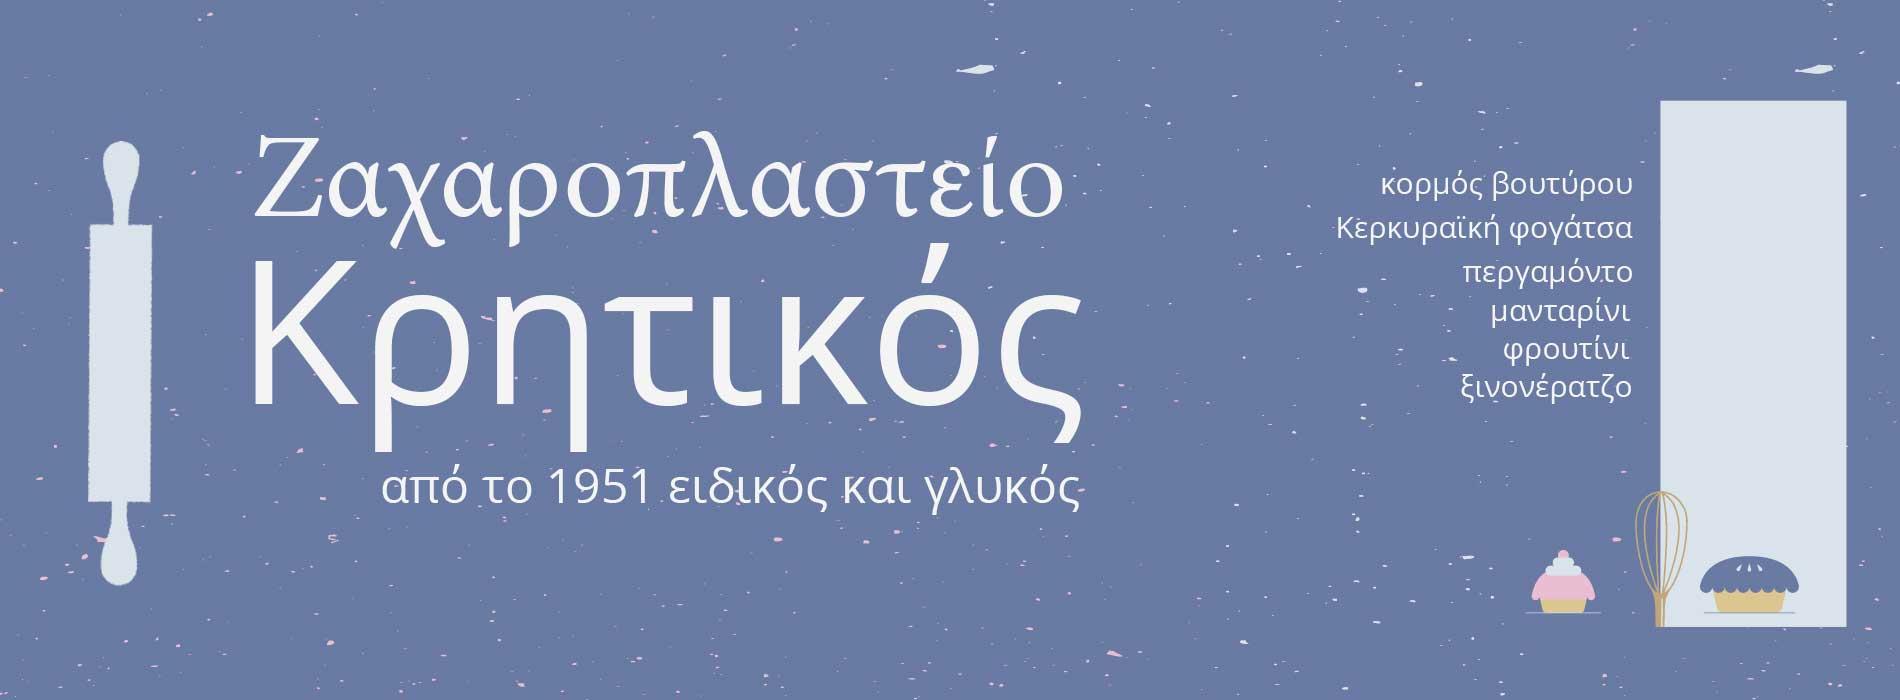 Kritikos Pastry, Ζαχαροπλαστείο Κρητικός 0 By Onesmart Promotion